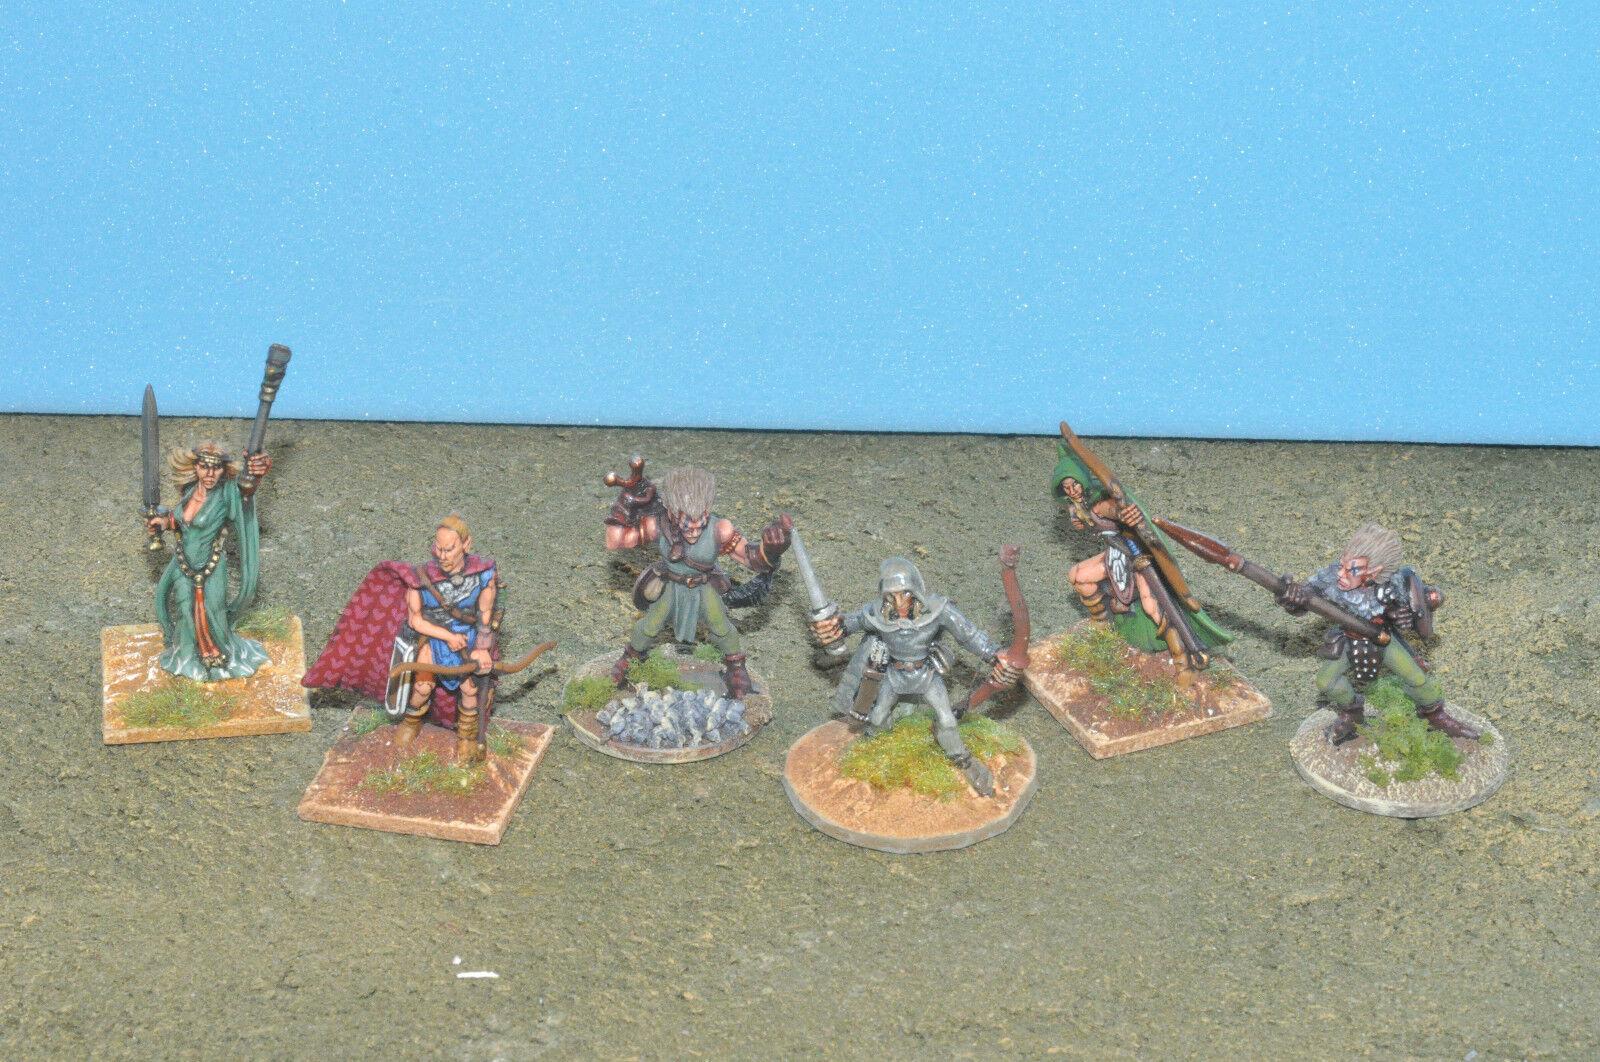 Wood elfs 6 heroes special characters metal d&d warhammer fantasy sigmar  (8637)